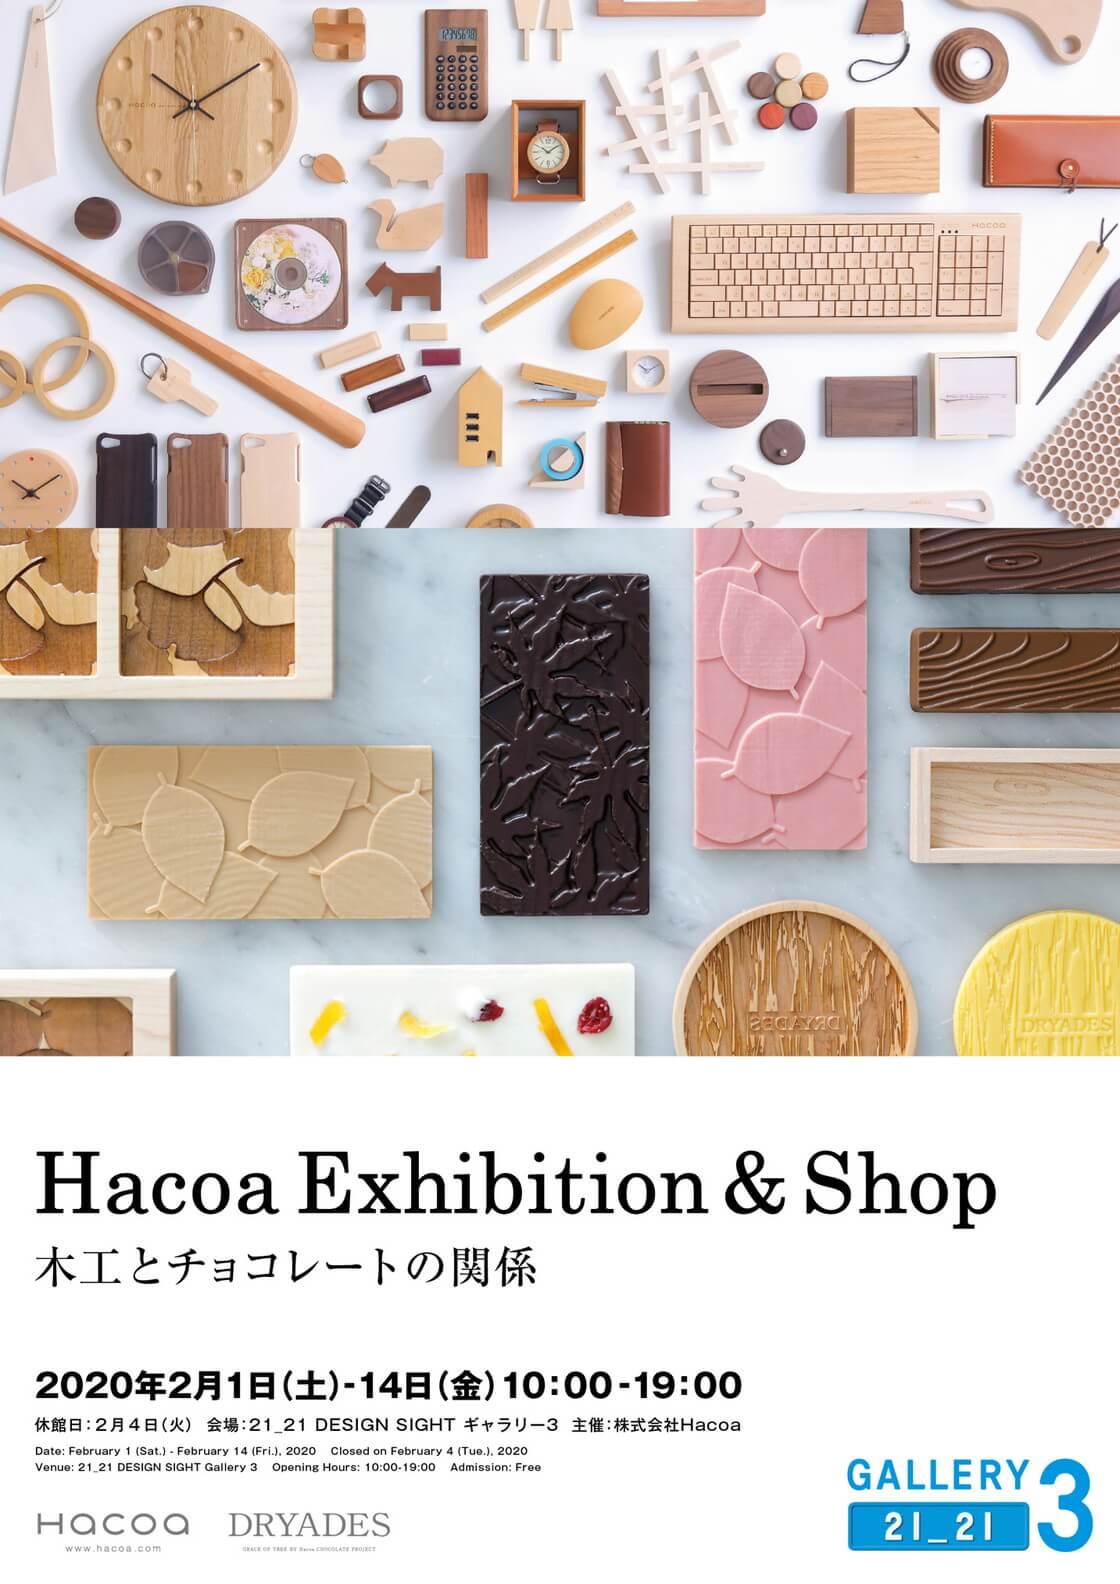 Hacoa Exhibition & Shop 木工とチョコレートの関係